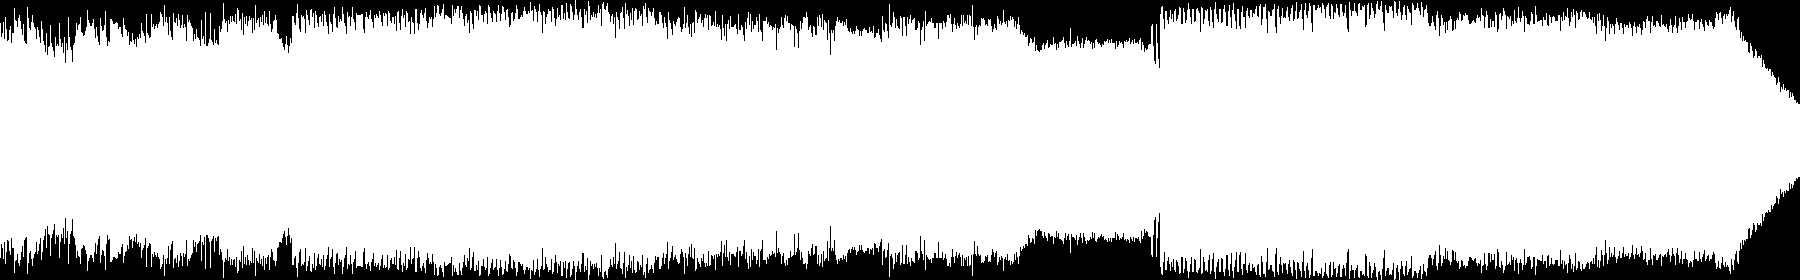 Nu-Trance audio waveform